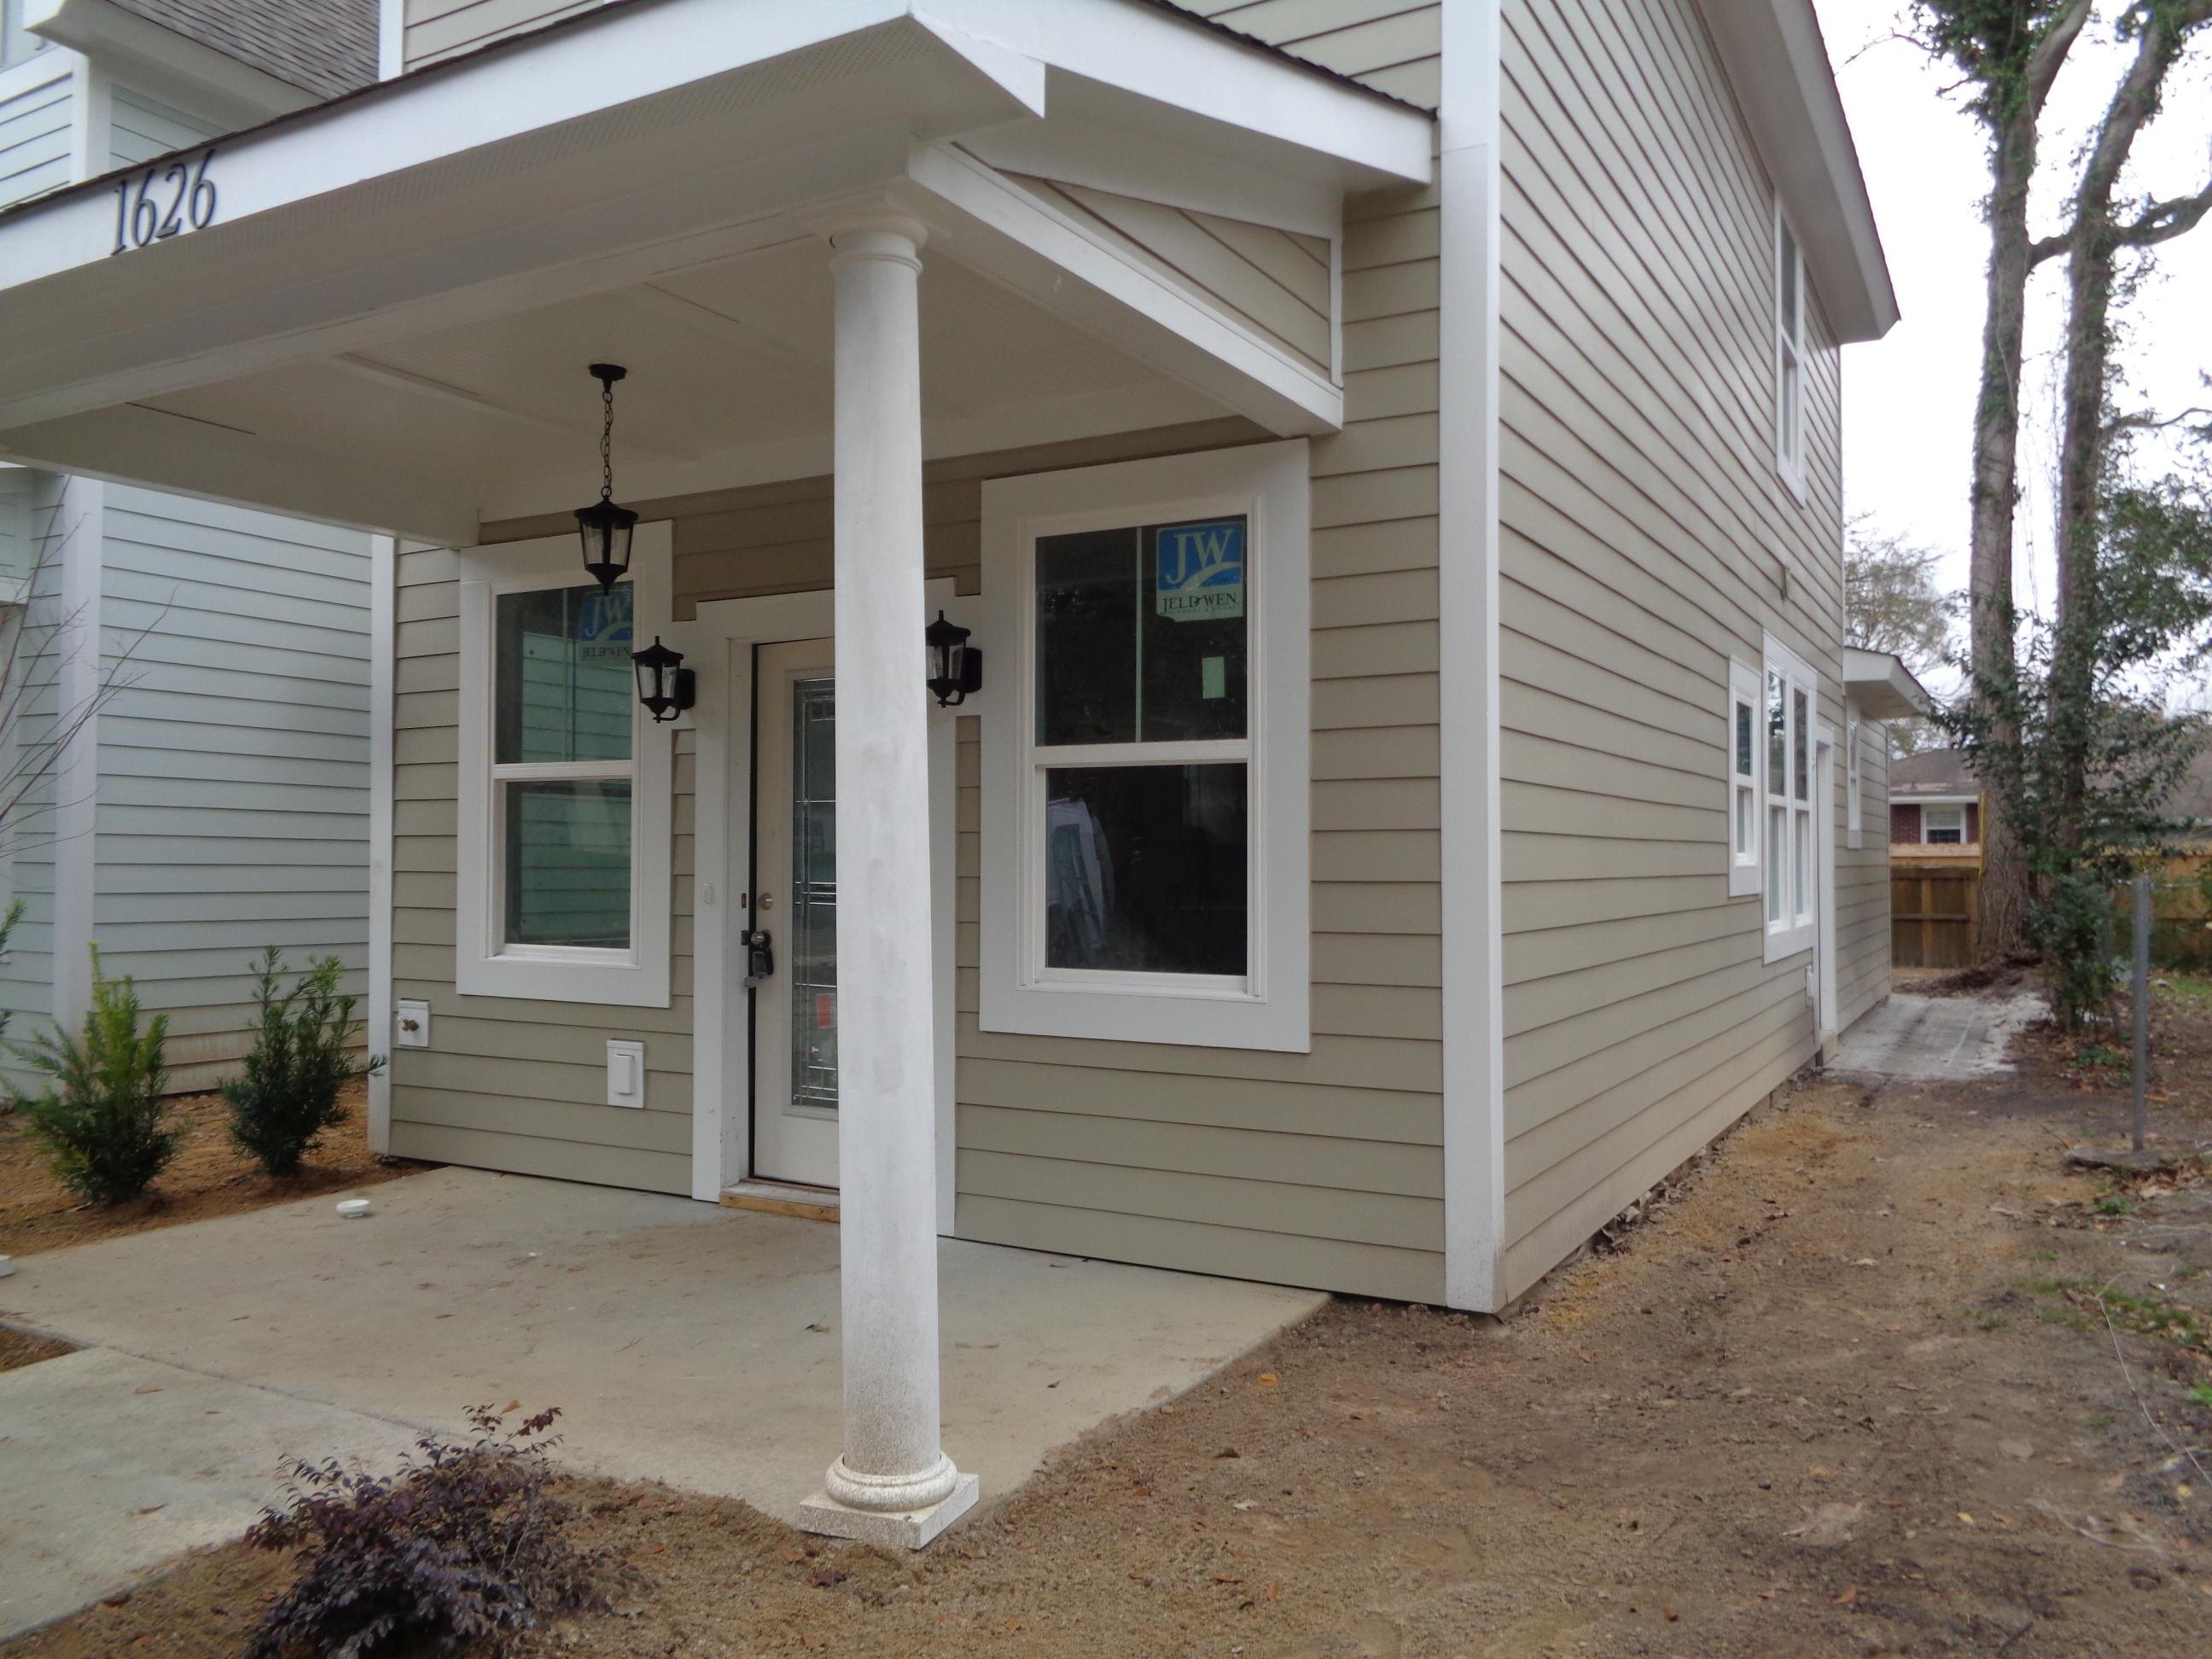 Pinecrest Gardens Homes For Sale - 1626 Wappoo, Charleston, SC - 29